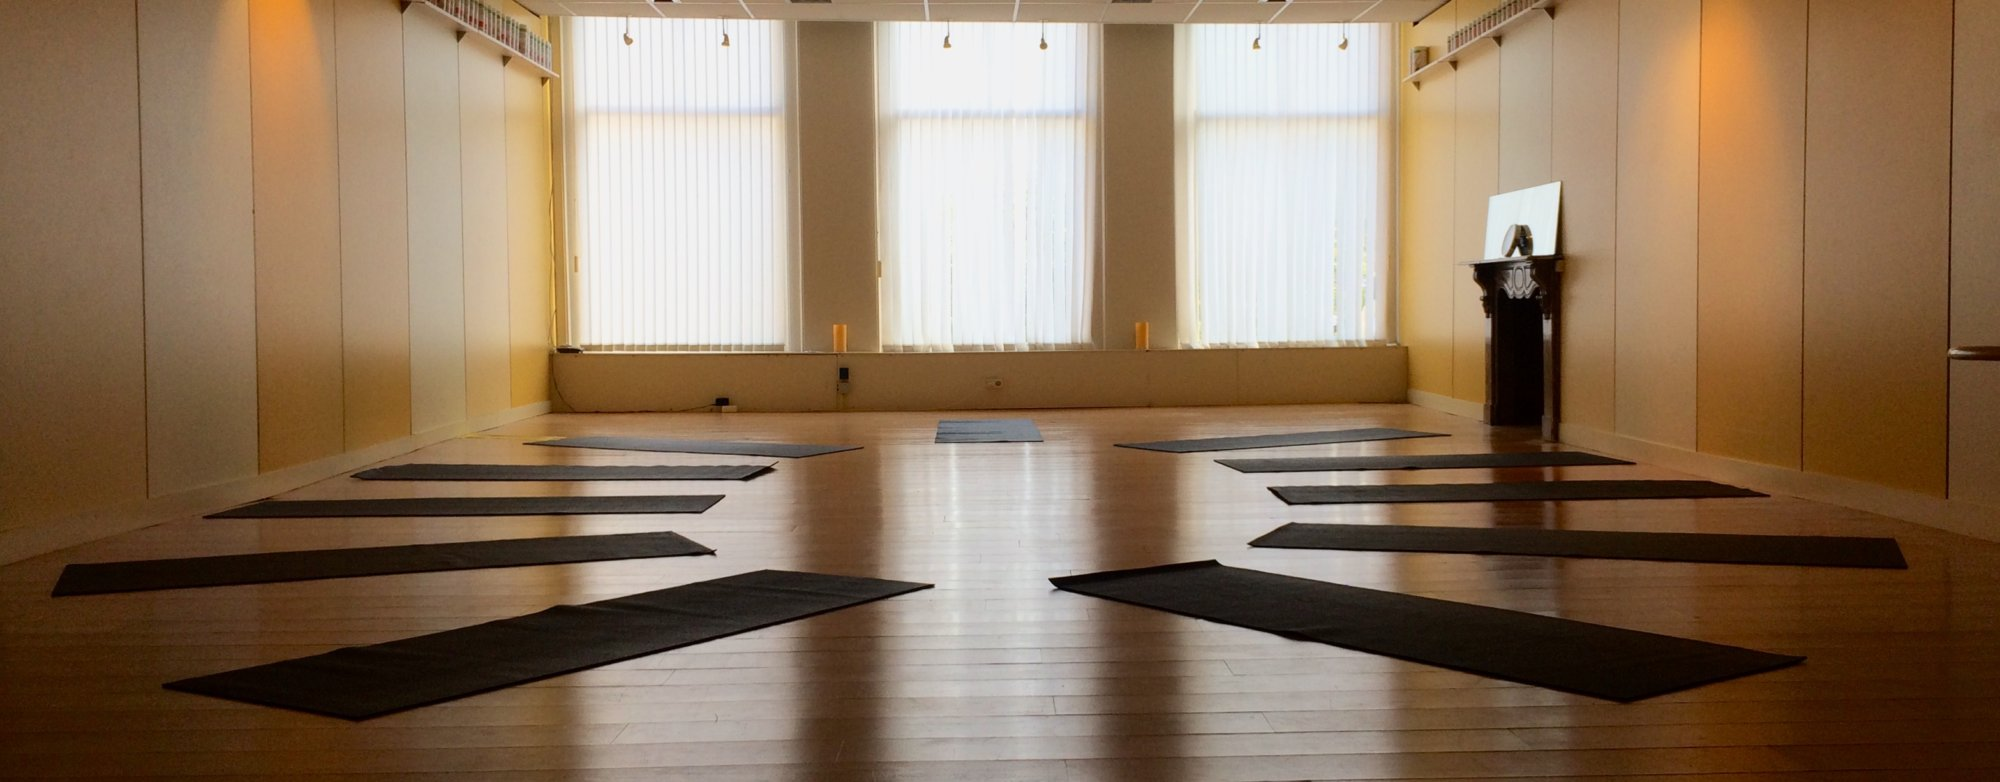 Lesrooster Bendie Yoga Leeuwarden